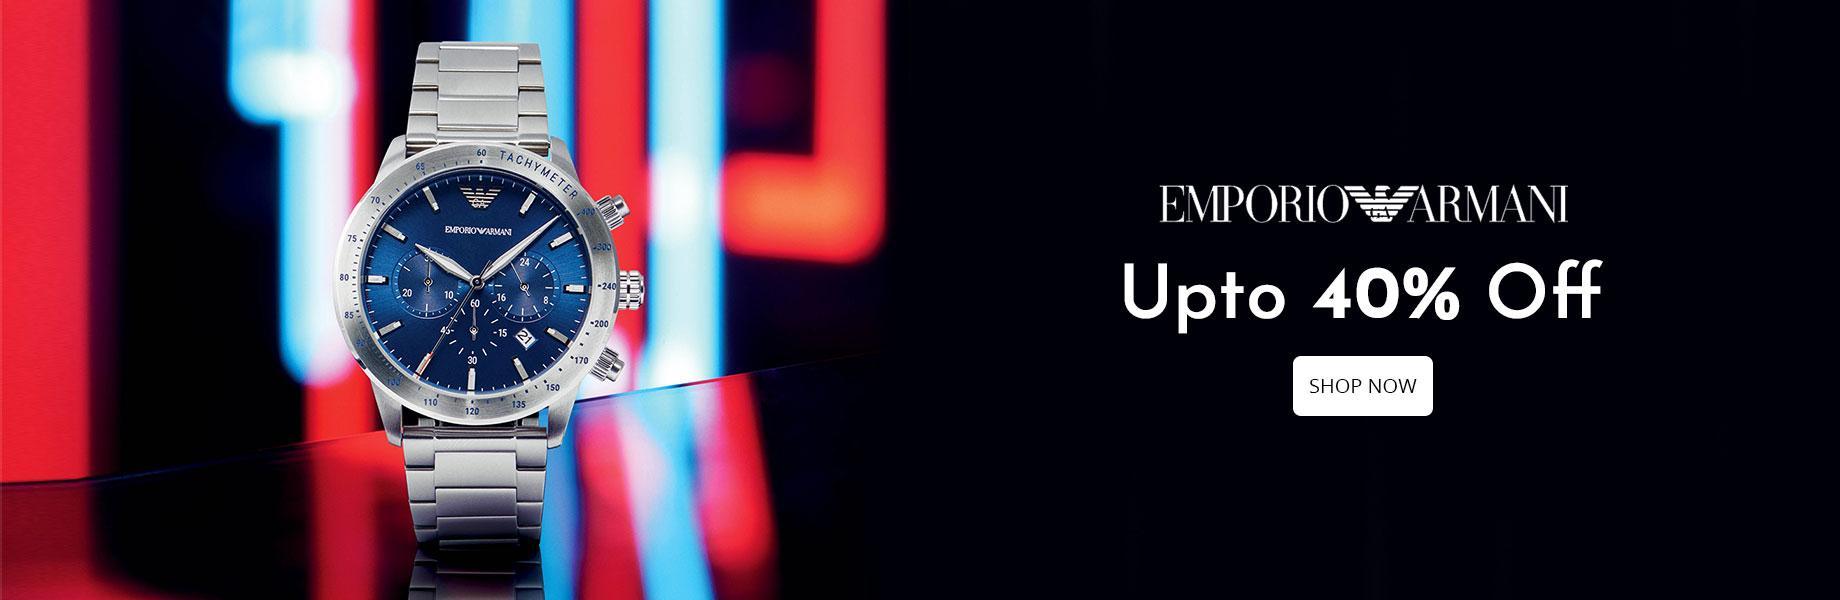 Home-PG-Watch-Brands-Static-Emporio-Armani-Web.jpg